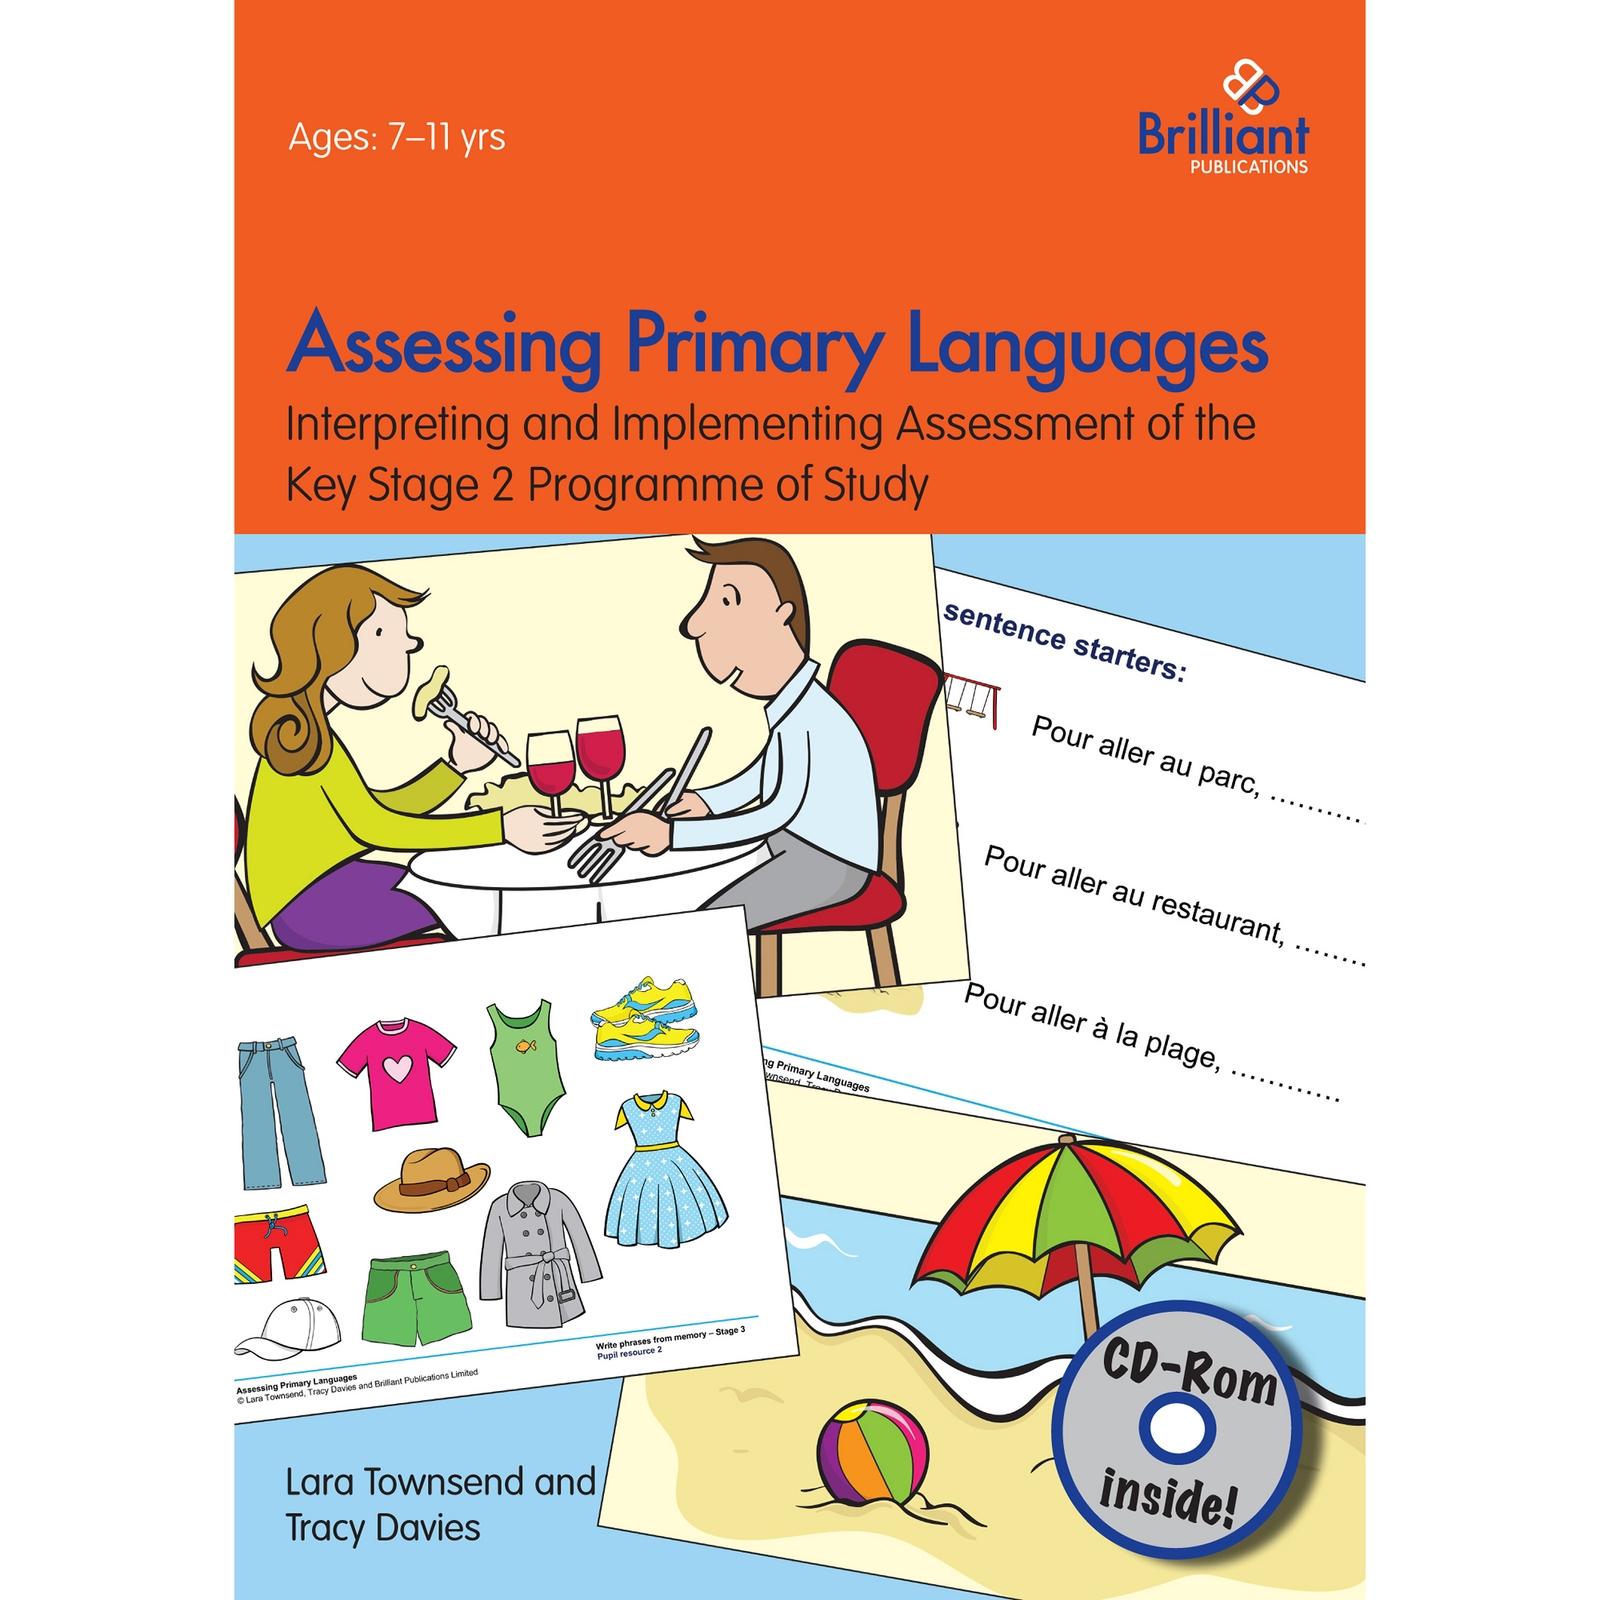 Assessing Primary Languages